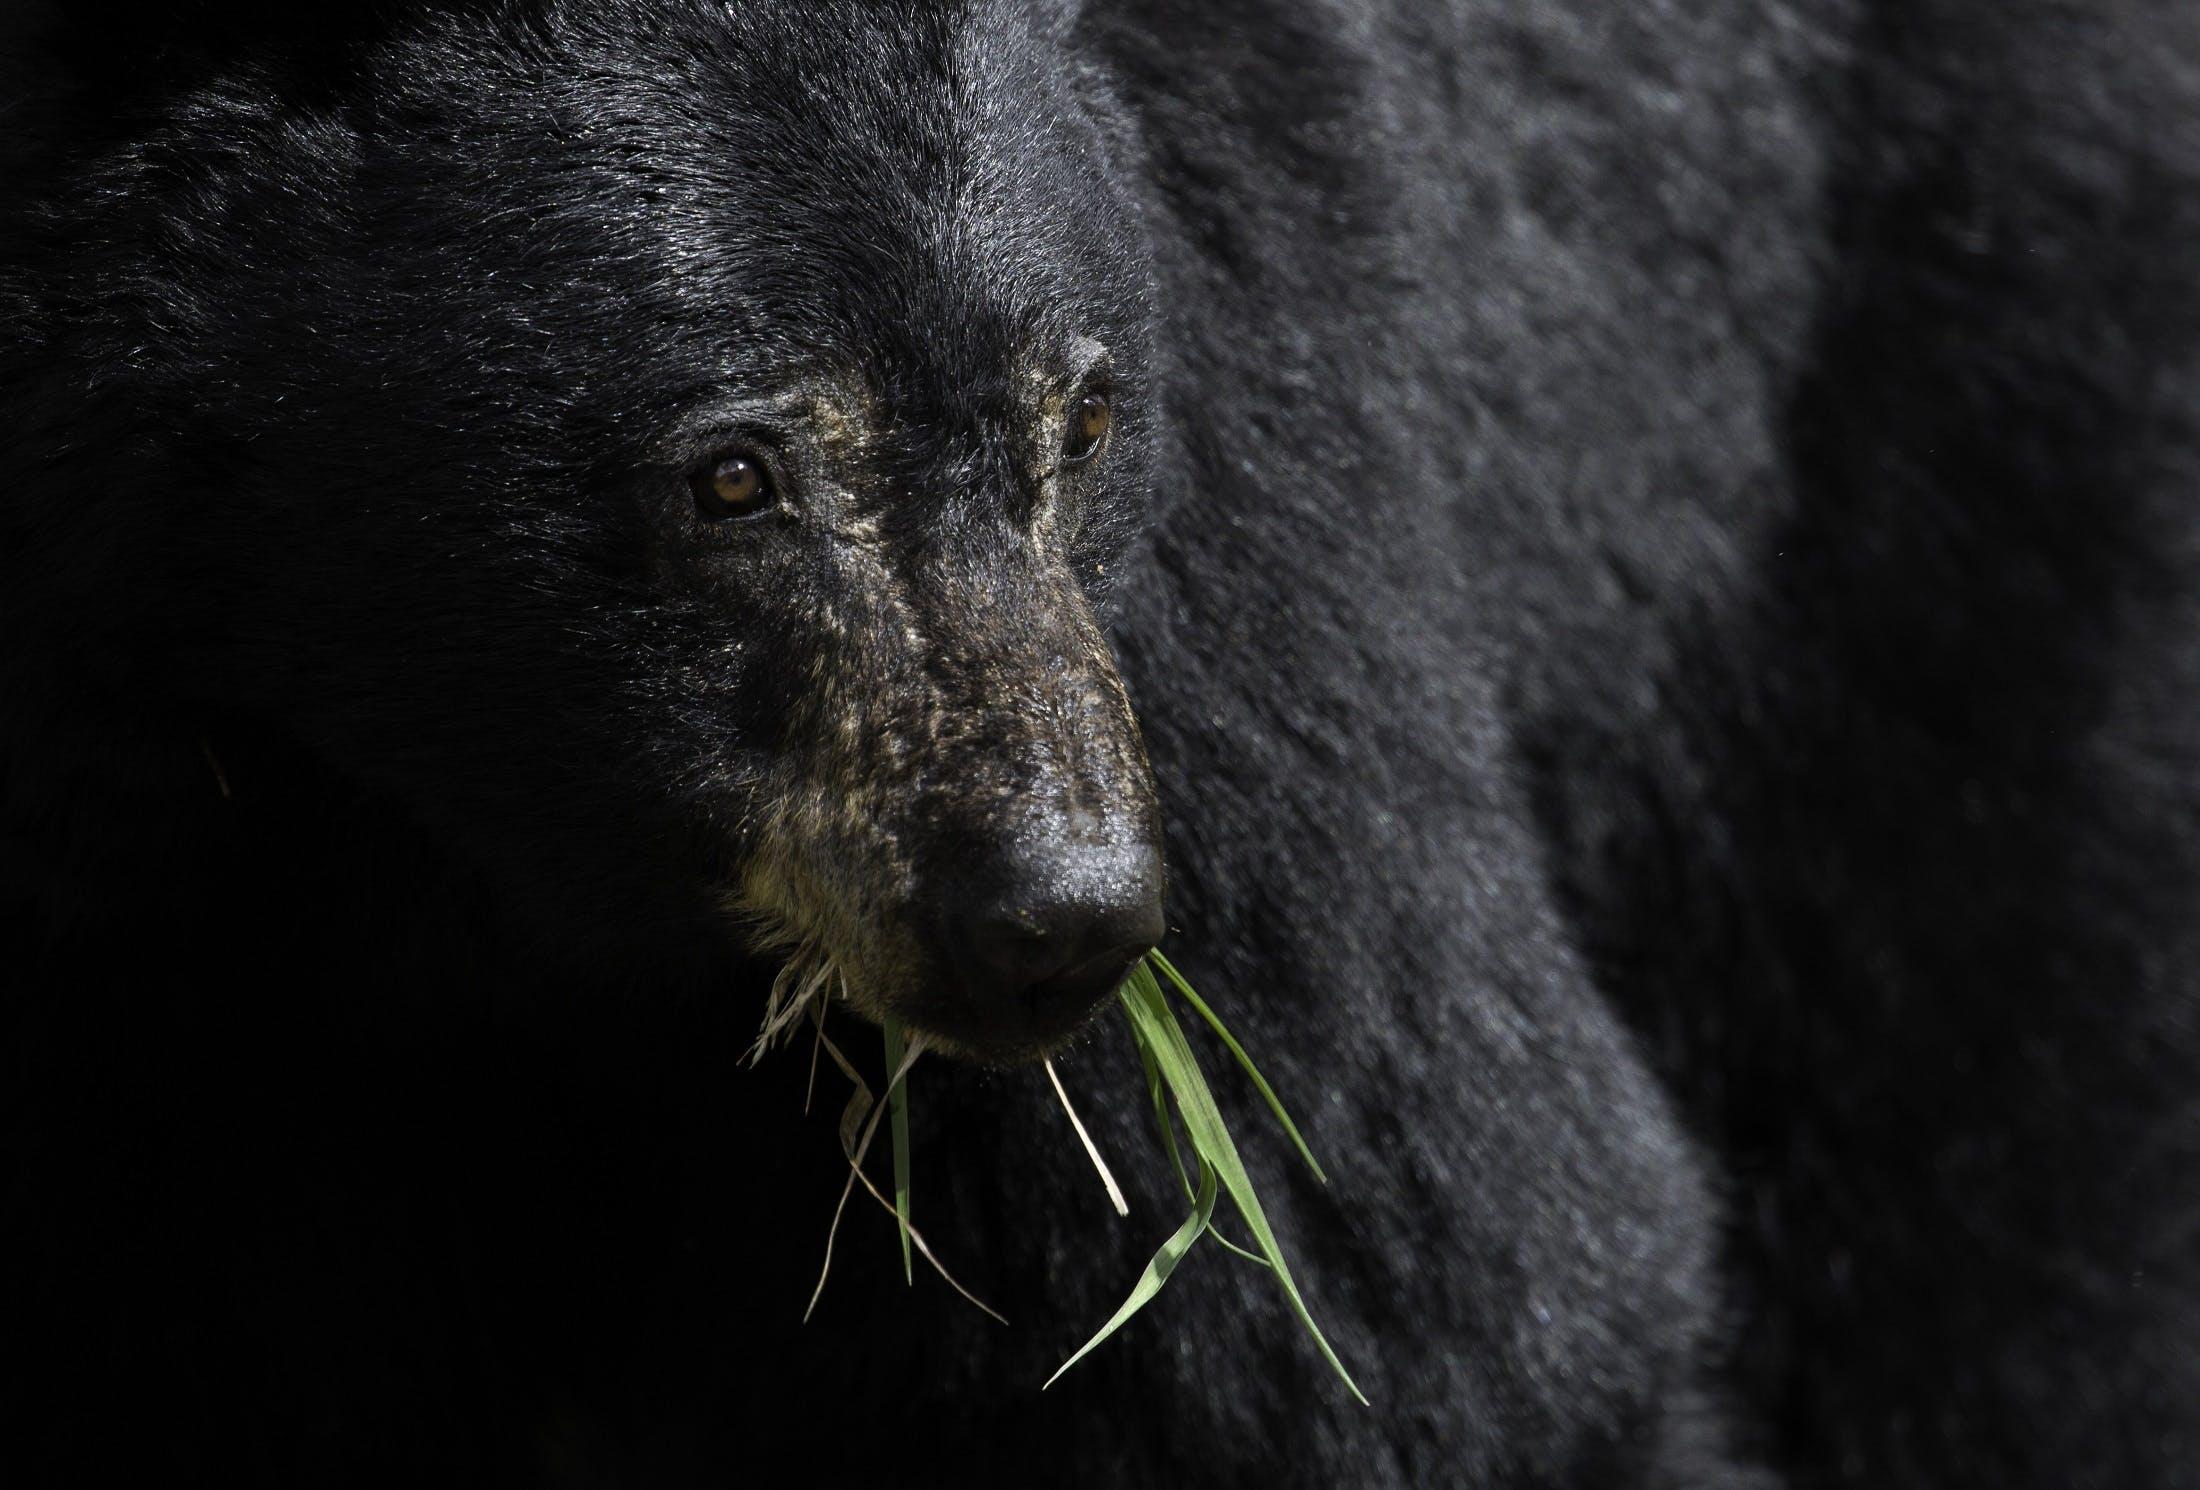 Free stock photo of nature, eating, animal, big